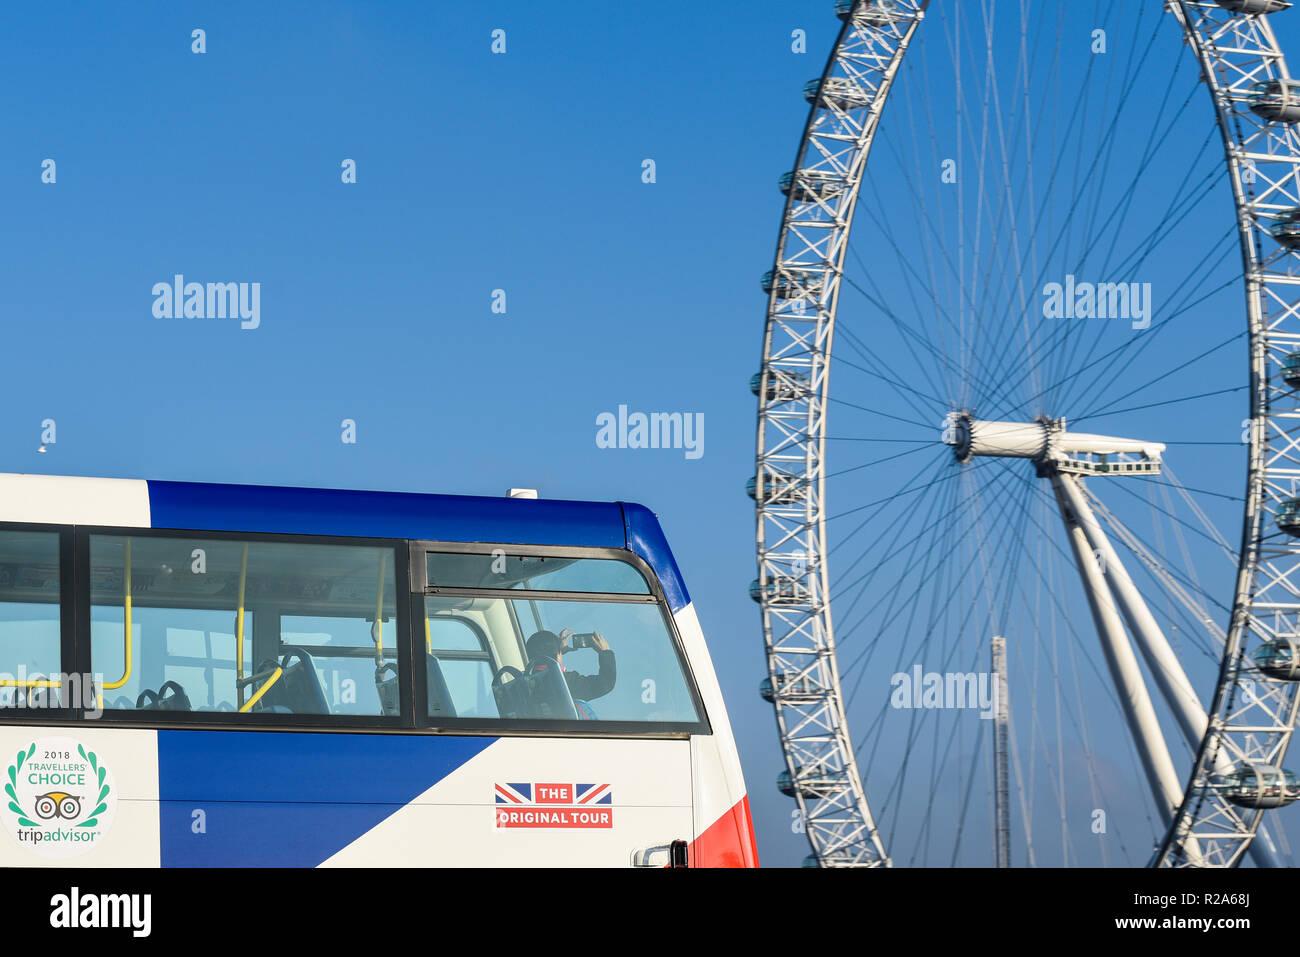 A tourist on a British tour bus taking a mobile phone camera phone photograph of the London Eye, Millennium Wheel. Tripadvisor, the Original Tour - Stock Image